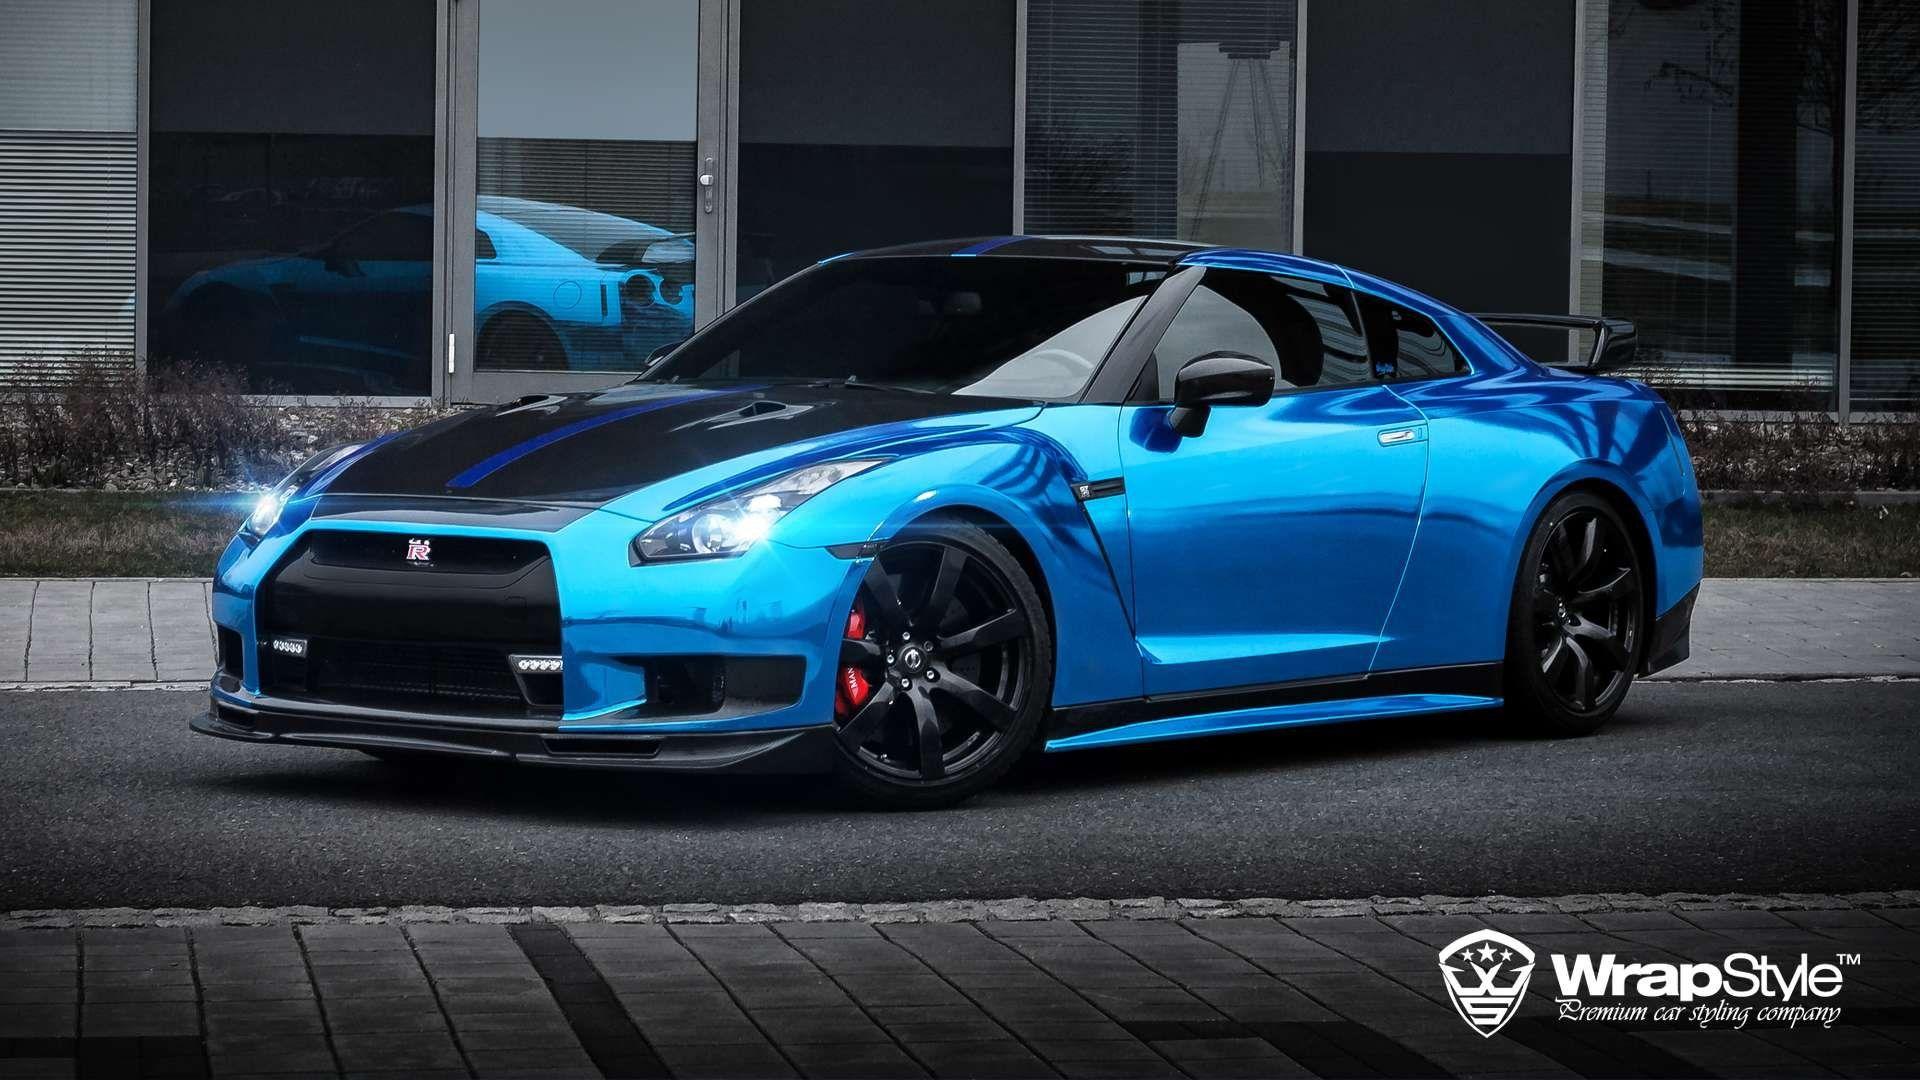 Nissan nissan deportivos nissan gt r nissan gt r r35 tuning cars - Nissan Gtr Wrap